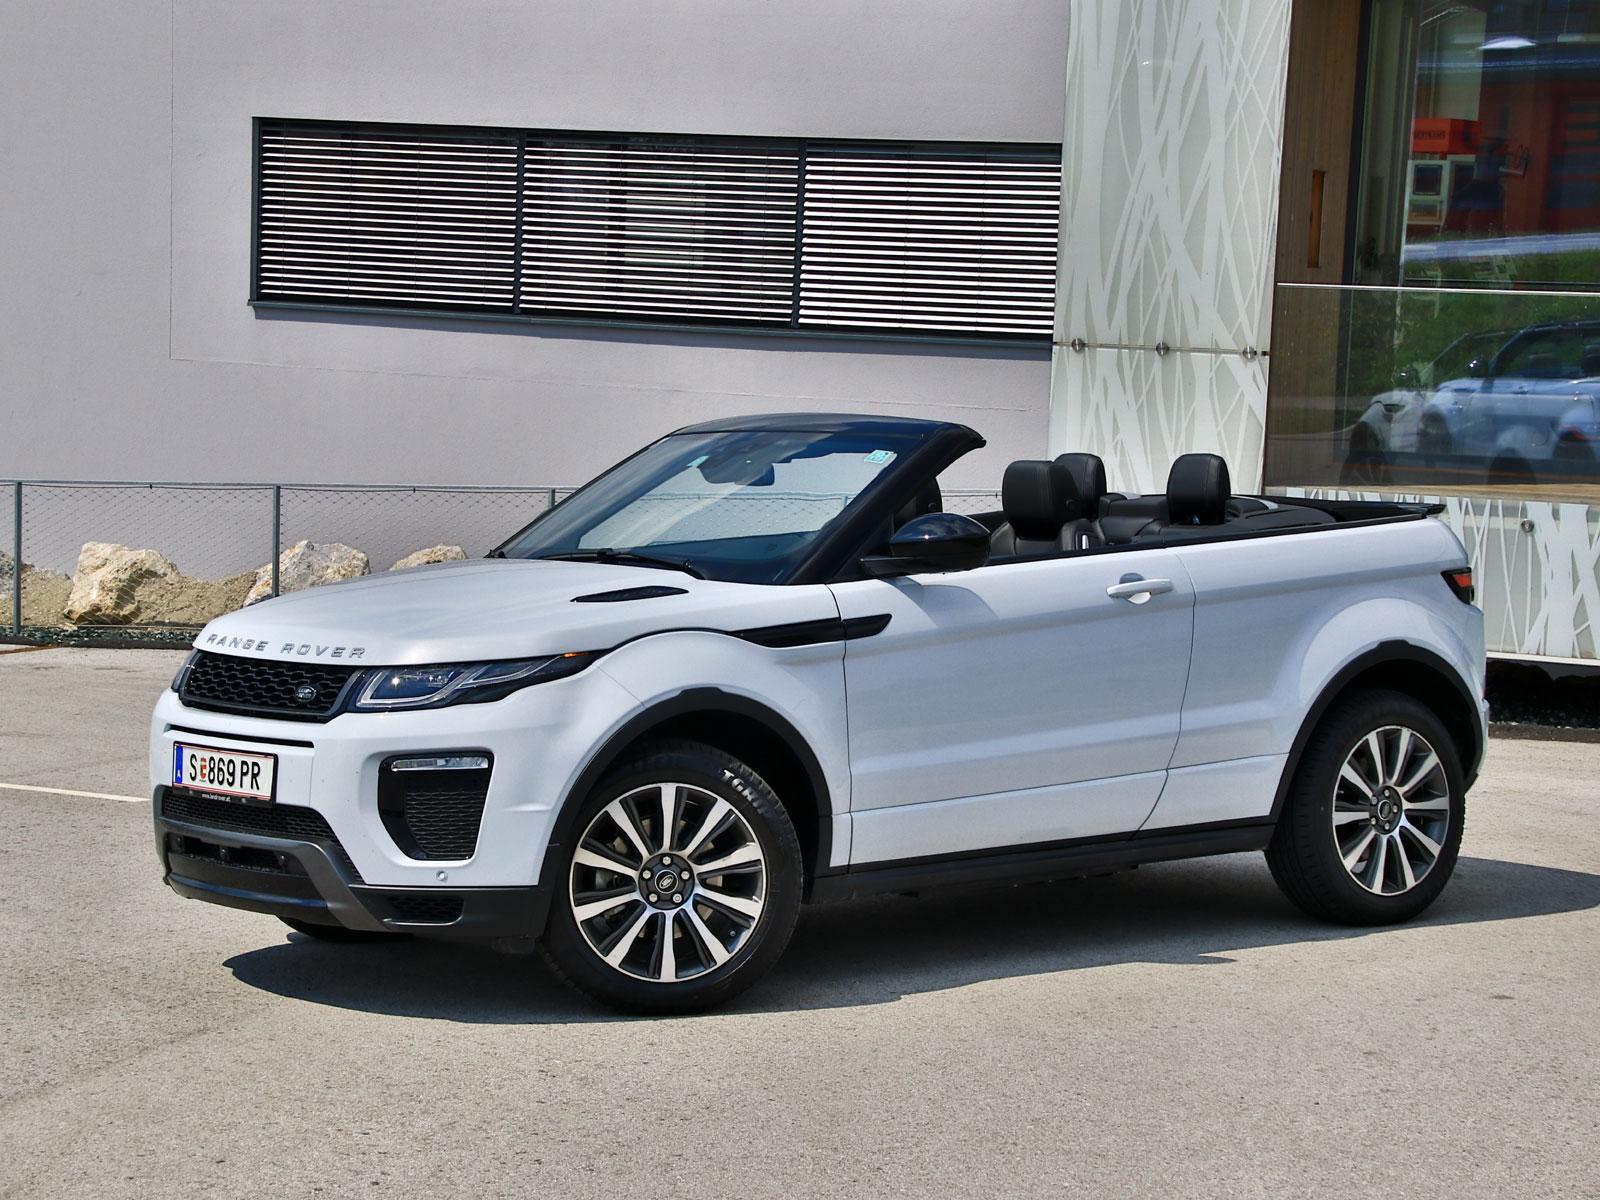 range rover evoque cabrio 2 0 td4 at hse dynamic. Black Bedroom Furniture Sets. Home Design Ideas